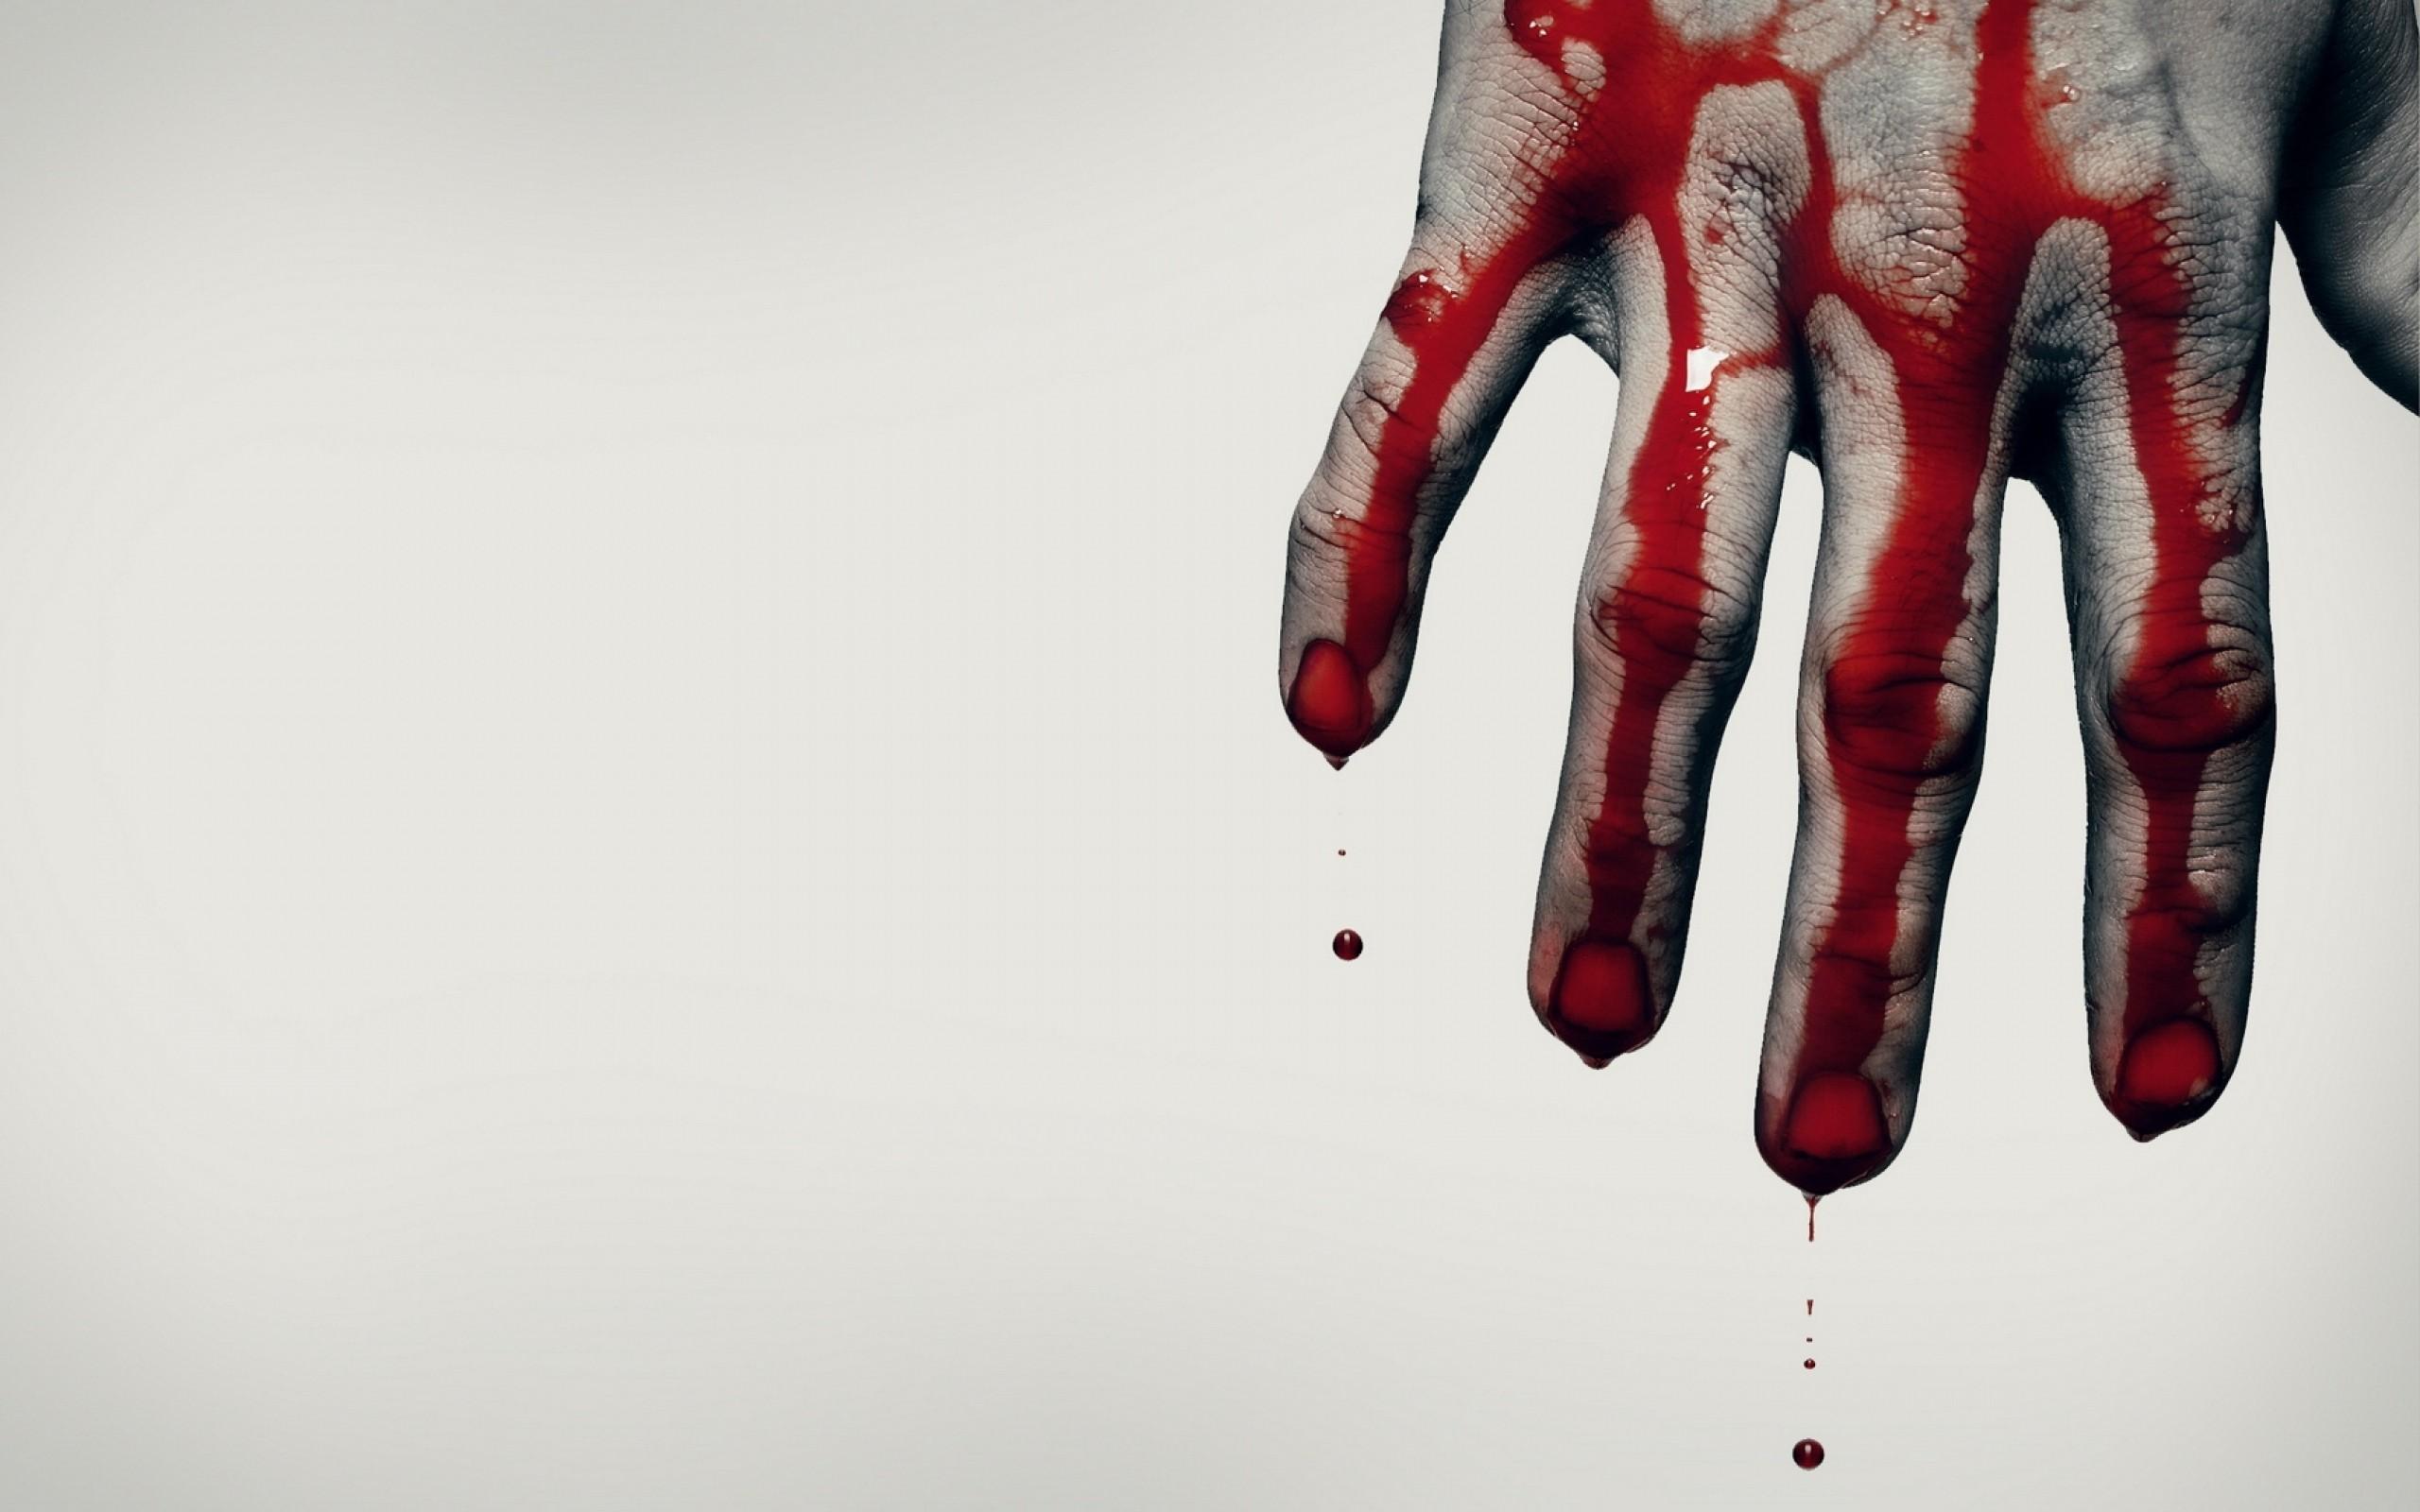 Bloody wallpaper ·...